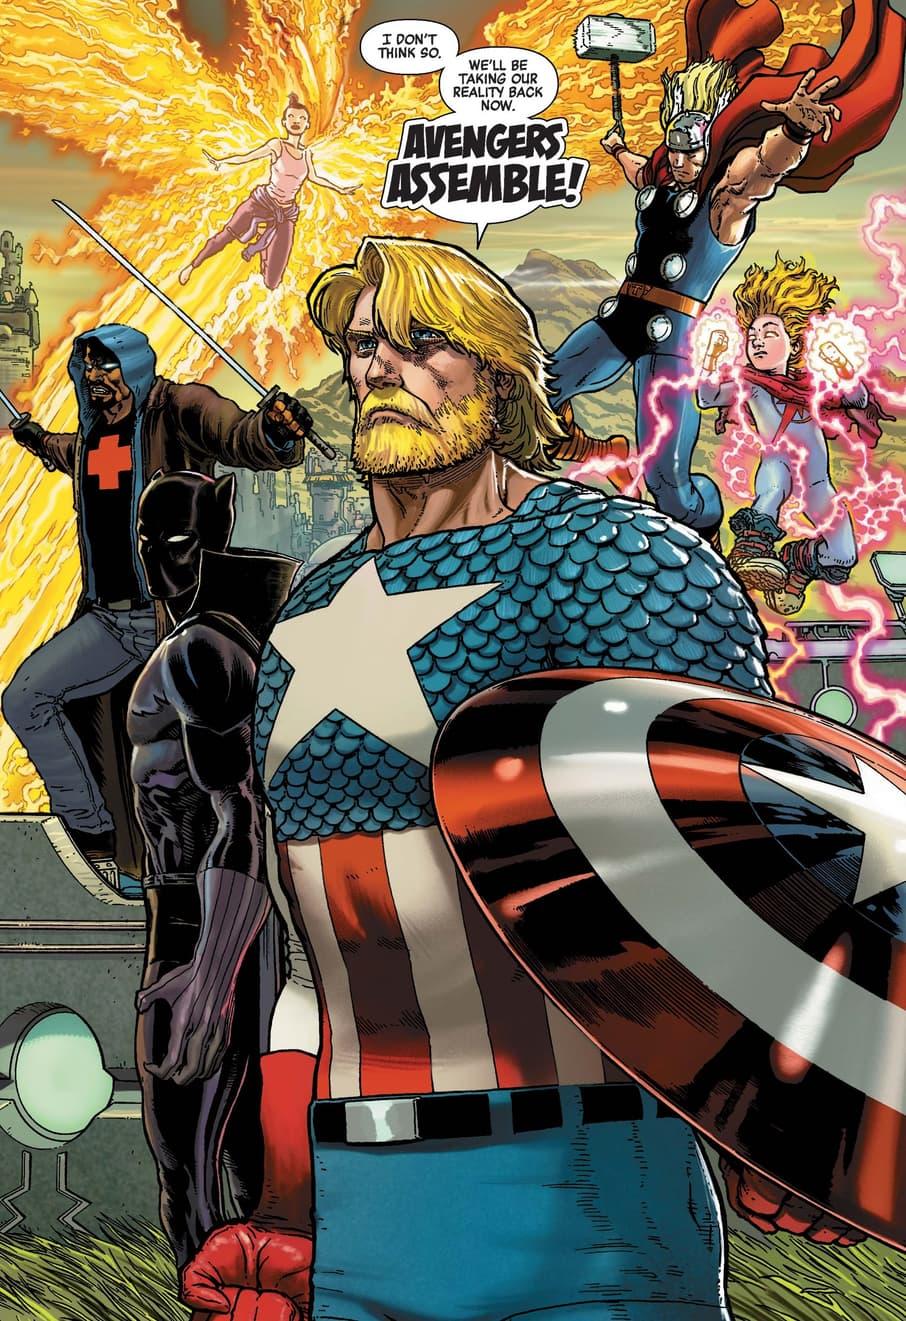 Steve Rogers assembles the Avengers in HEROES REBORN (2021) #7.